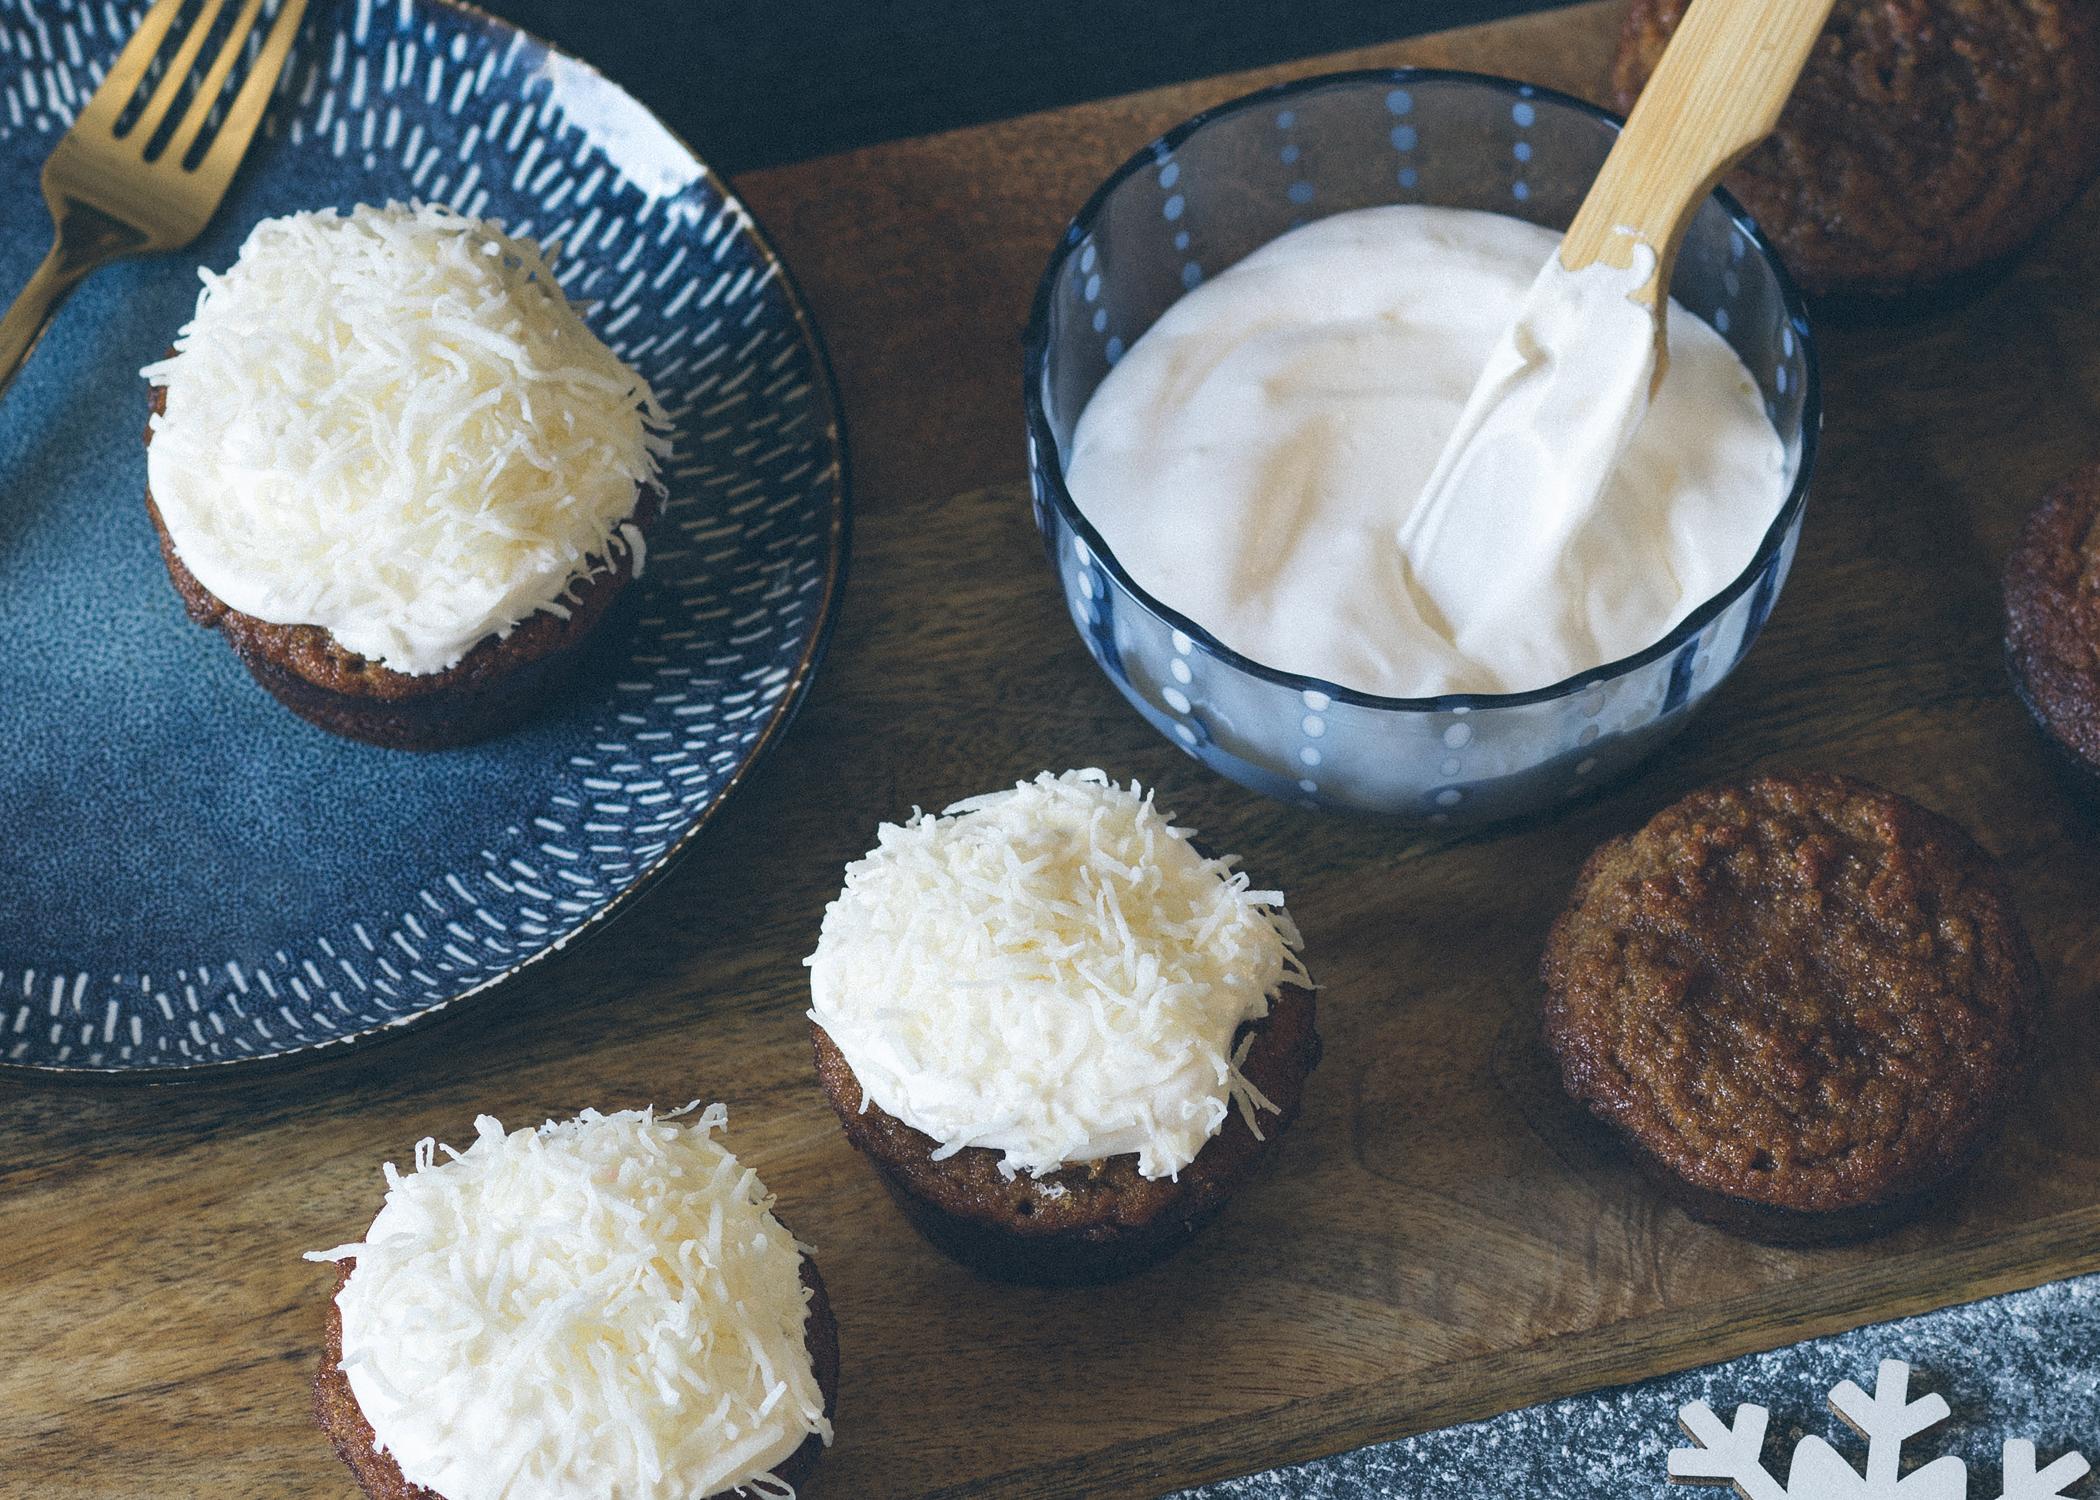 Gluten-Free_Chai_Coconut_Cupcake_with_Coconut_Whipped_Cream_HERO_V2.jpg